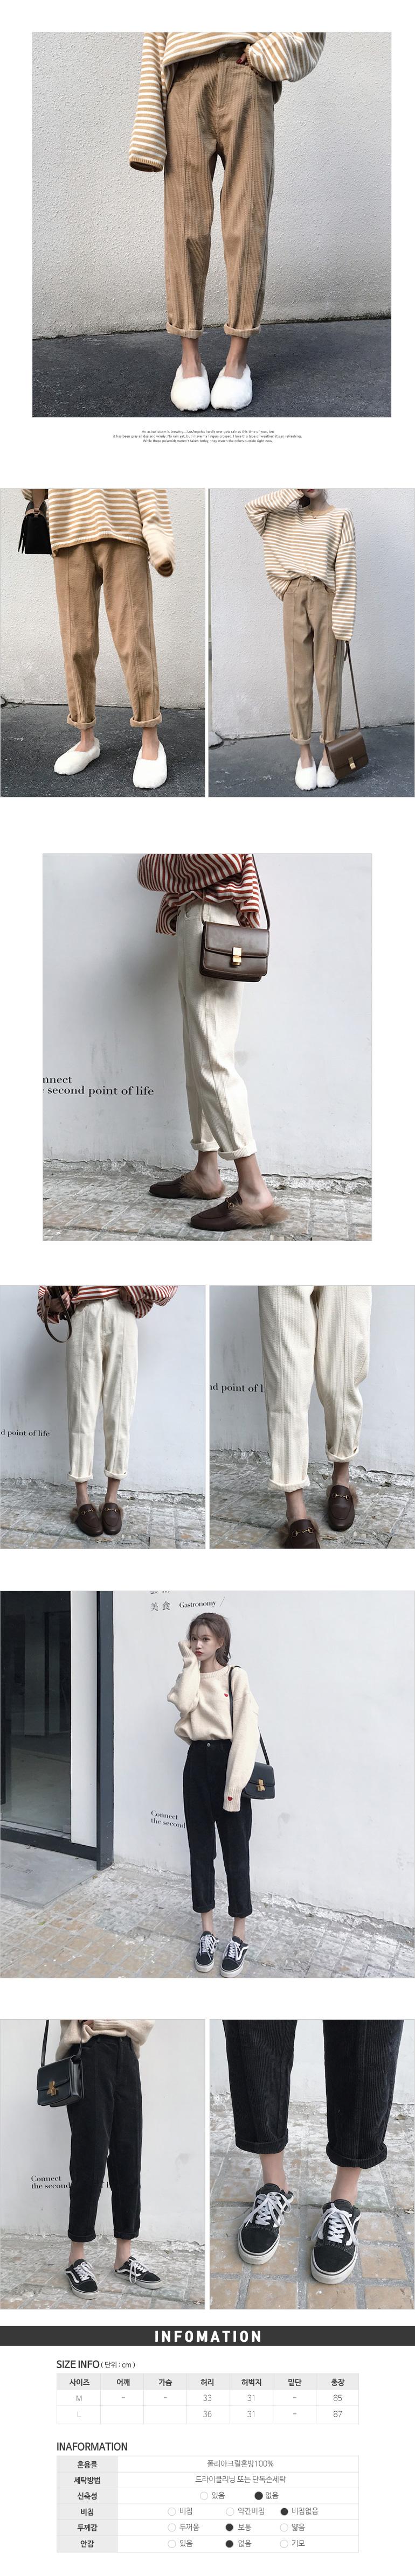 Hoven Corduroy Pants